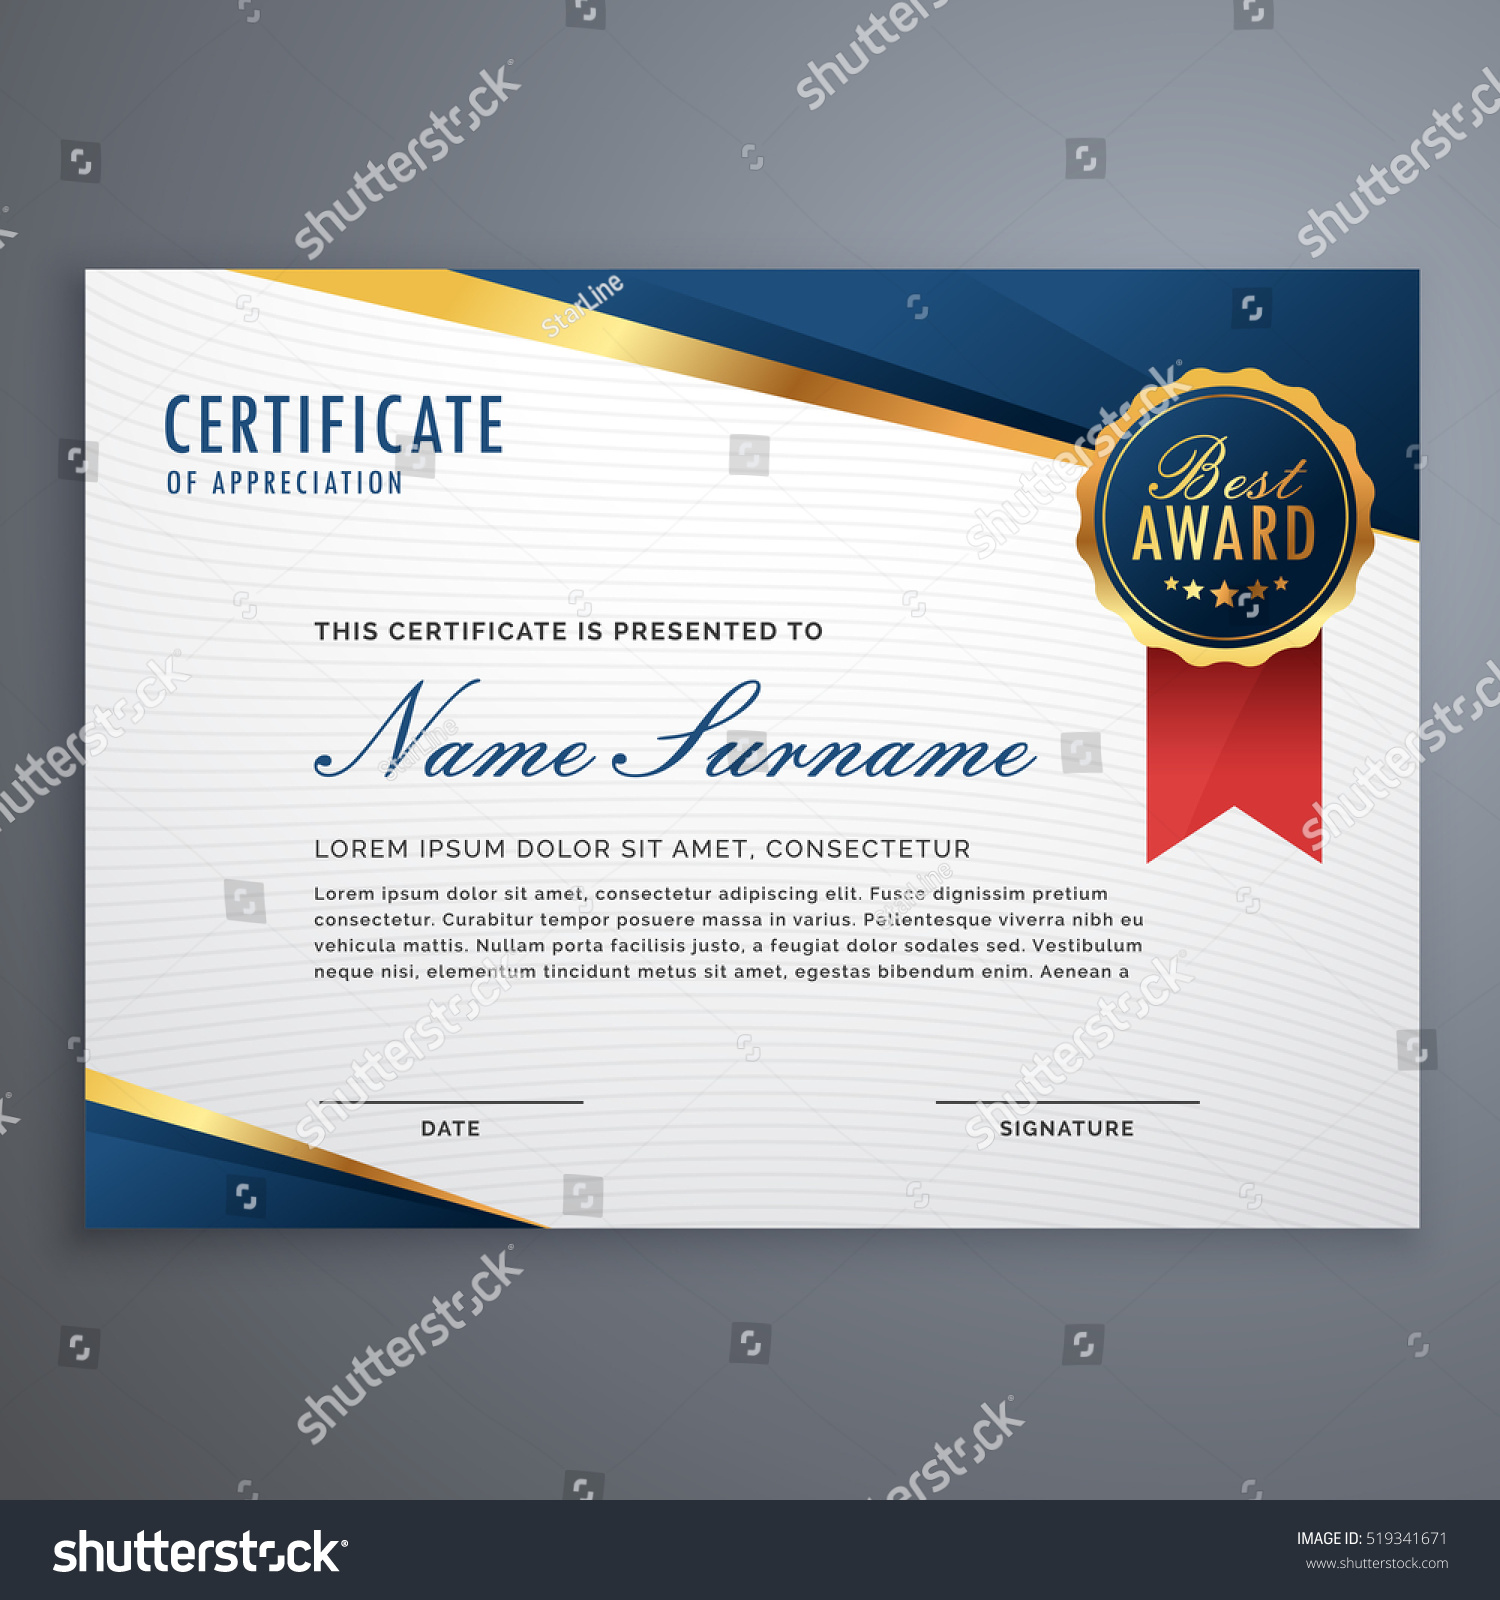 outstanding achievement certificate template